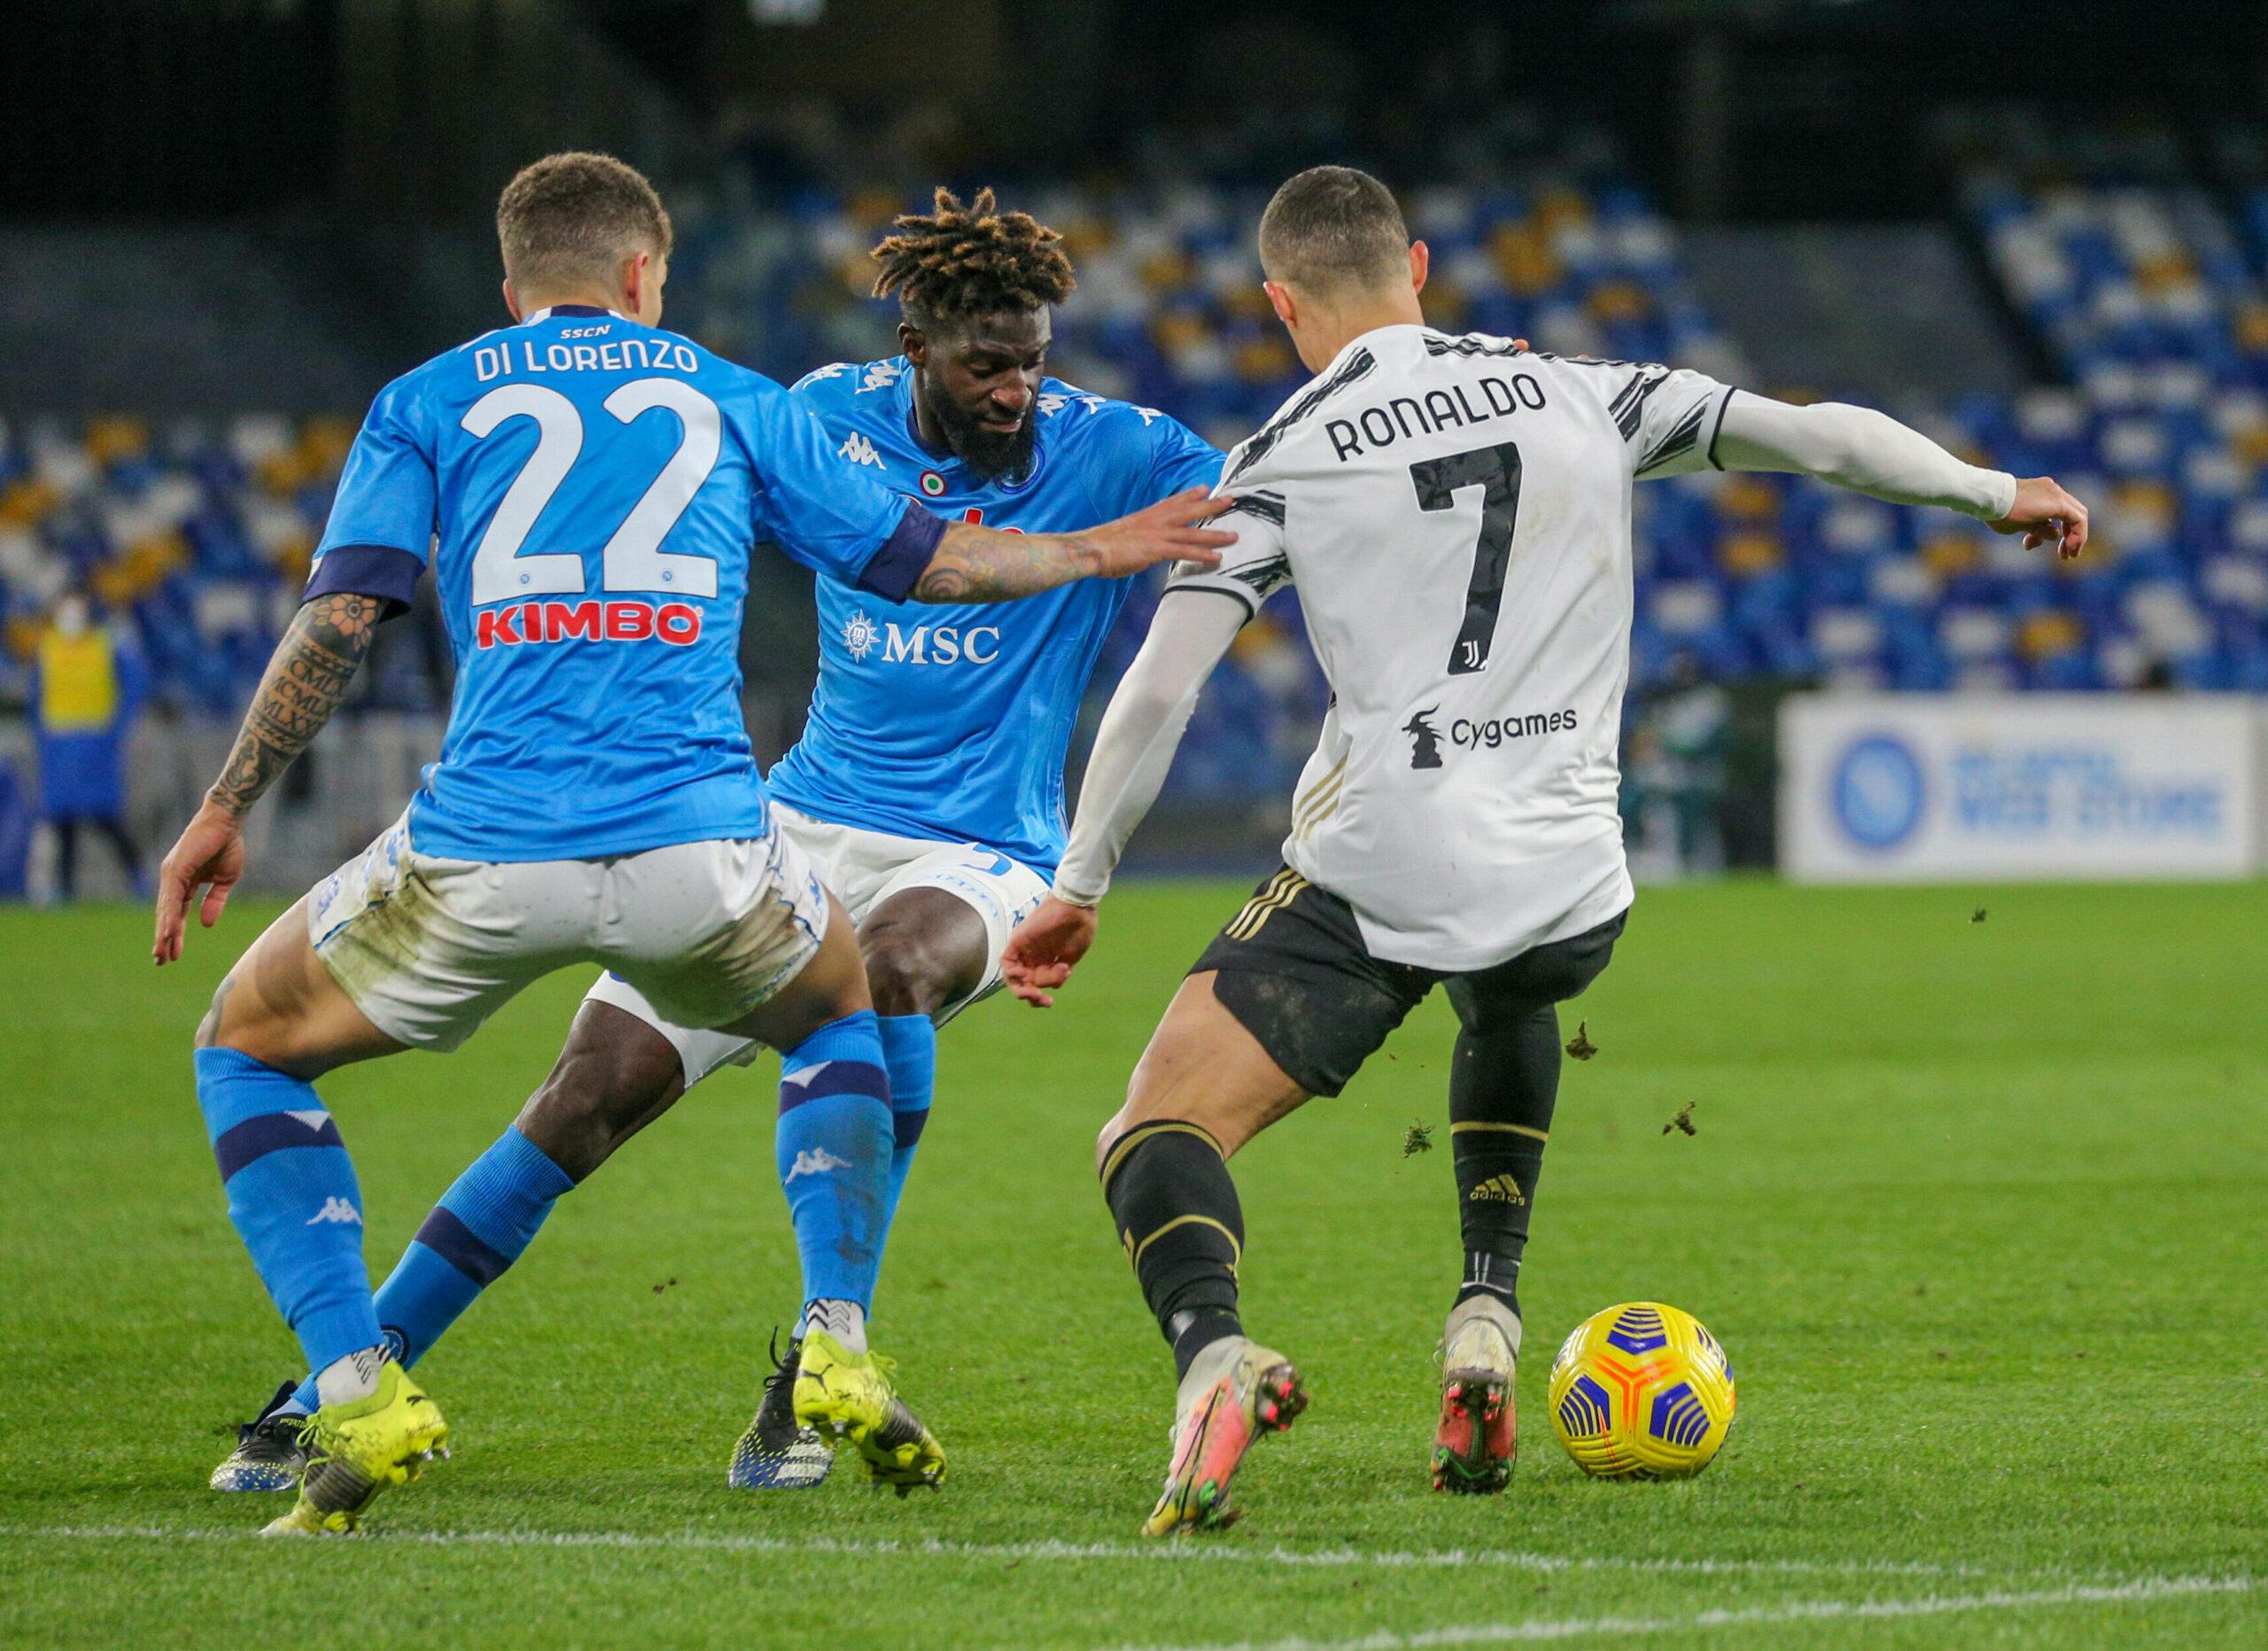 Ronaldo im Zweikampf mit Napolis Di Lorenzo und Bakayoko